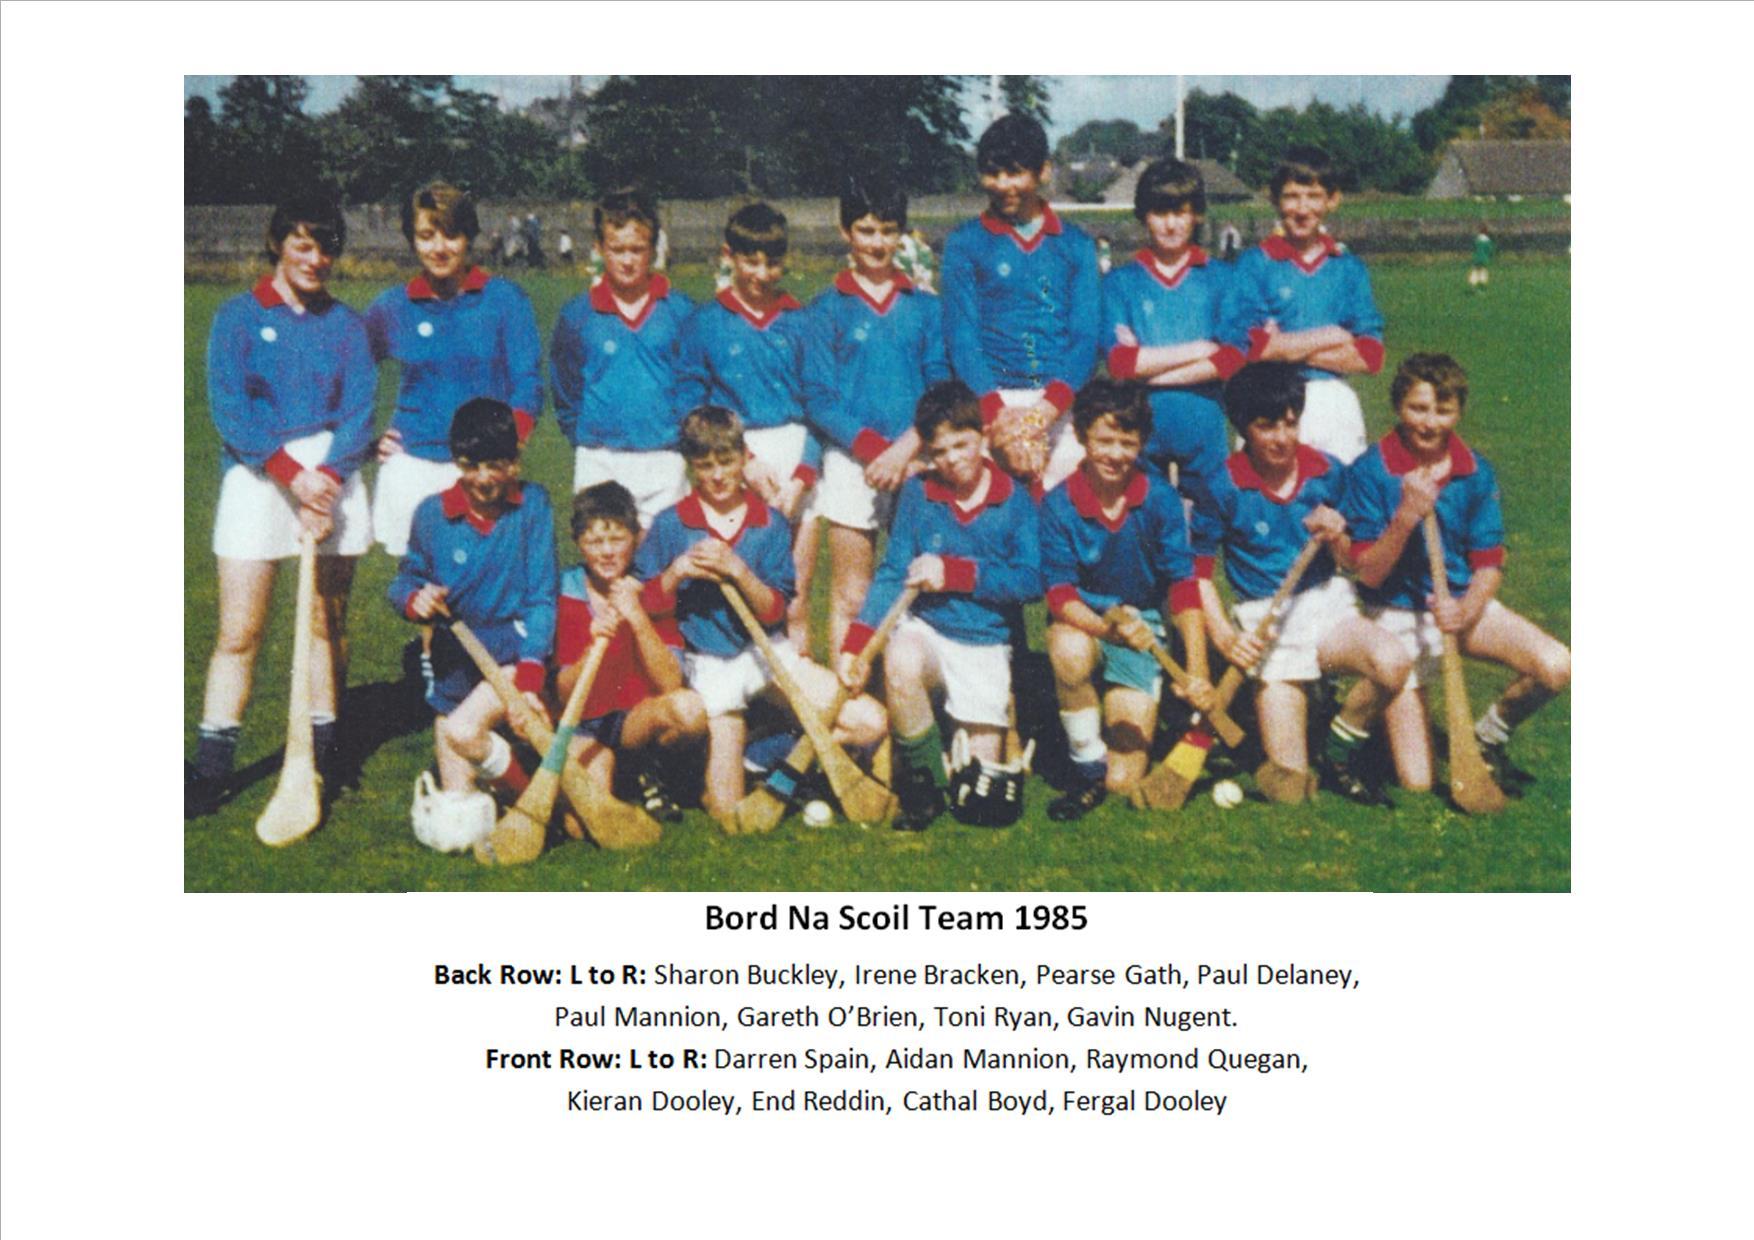 Bord Na Scoil Team - 1985